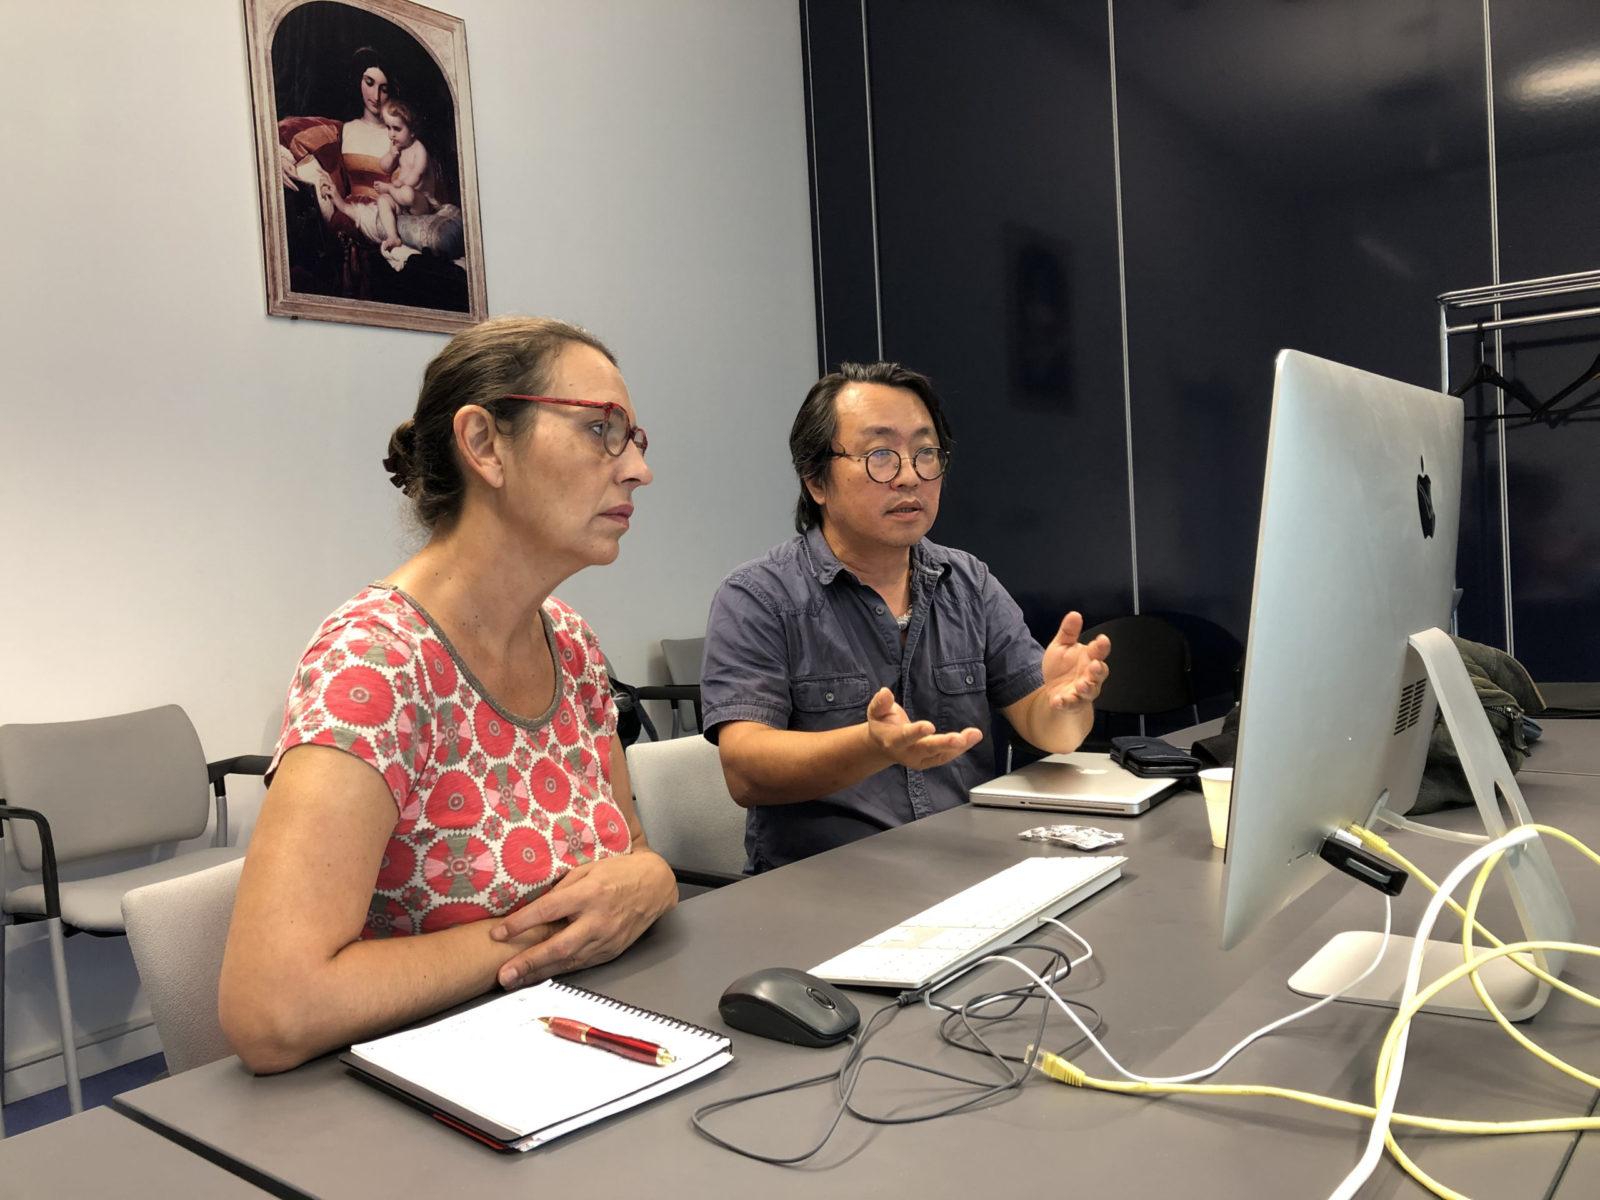 Third stage Taipei PAS workshop - Vincent Wang & Claire Lajourmard